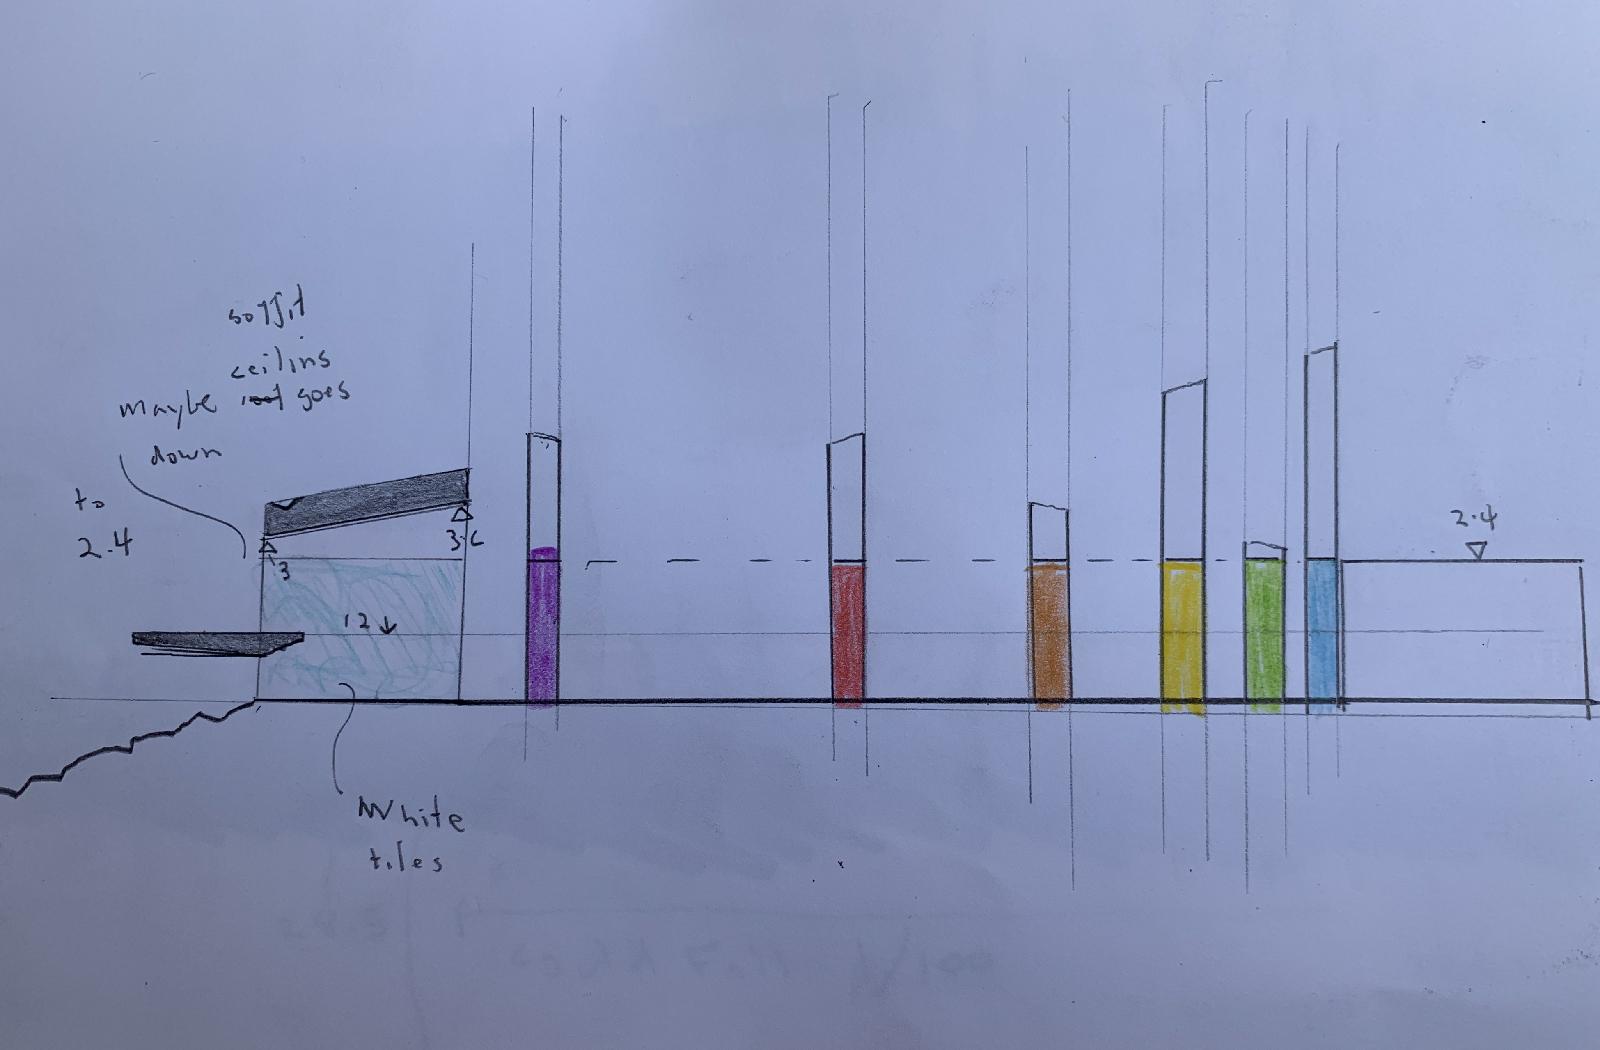 Bondi Memorial concept by McGregor Westlake Architecture and JILA